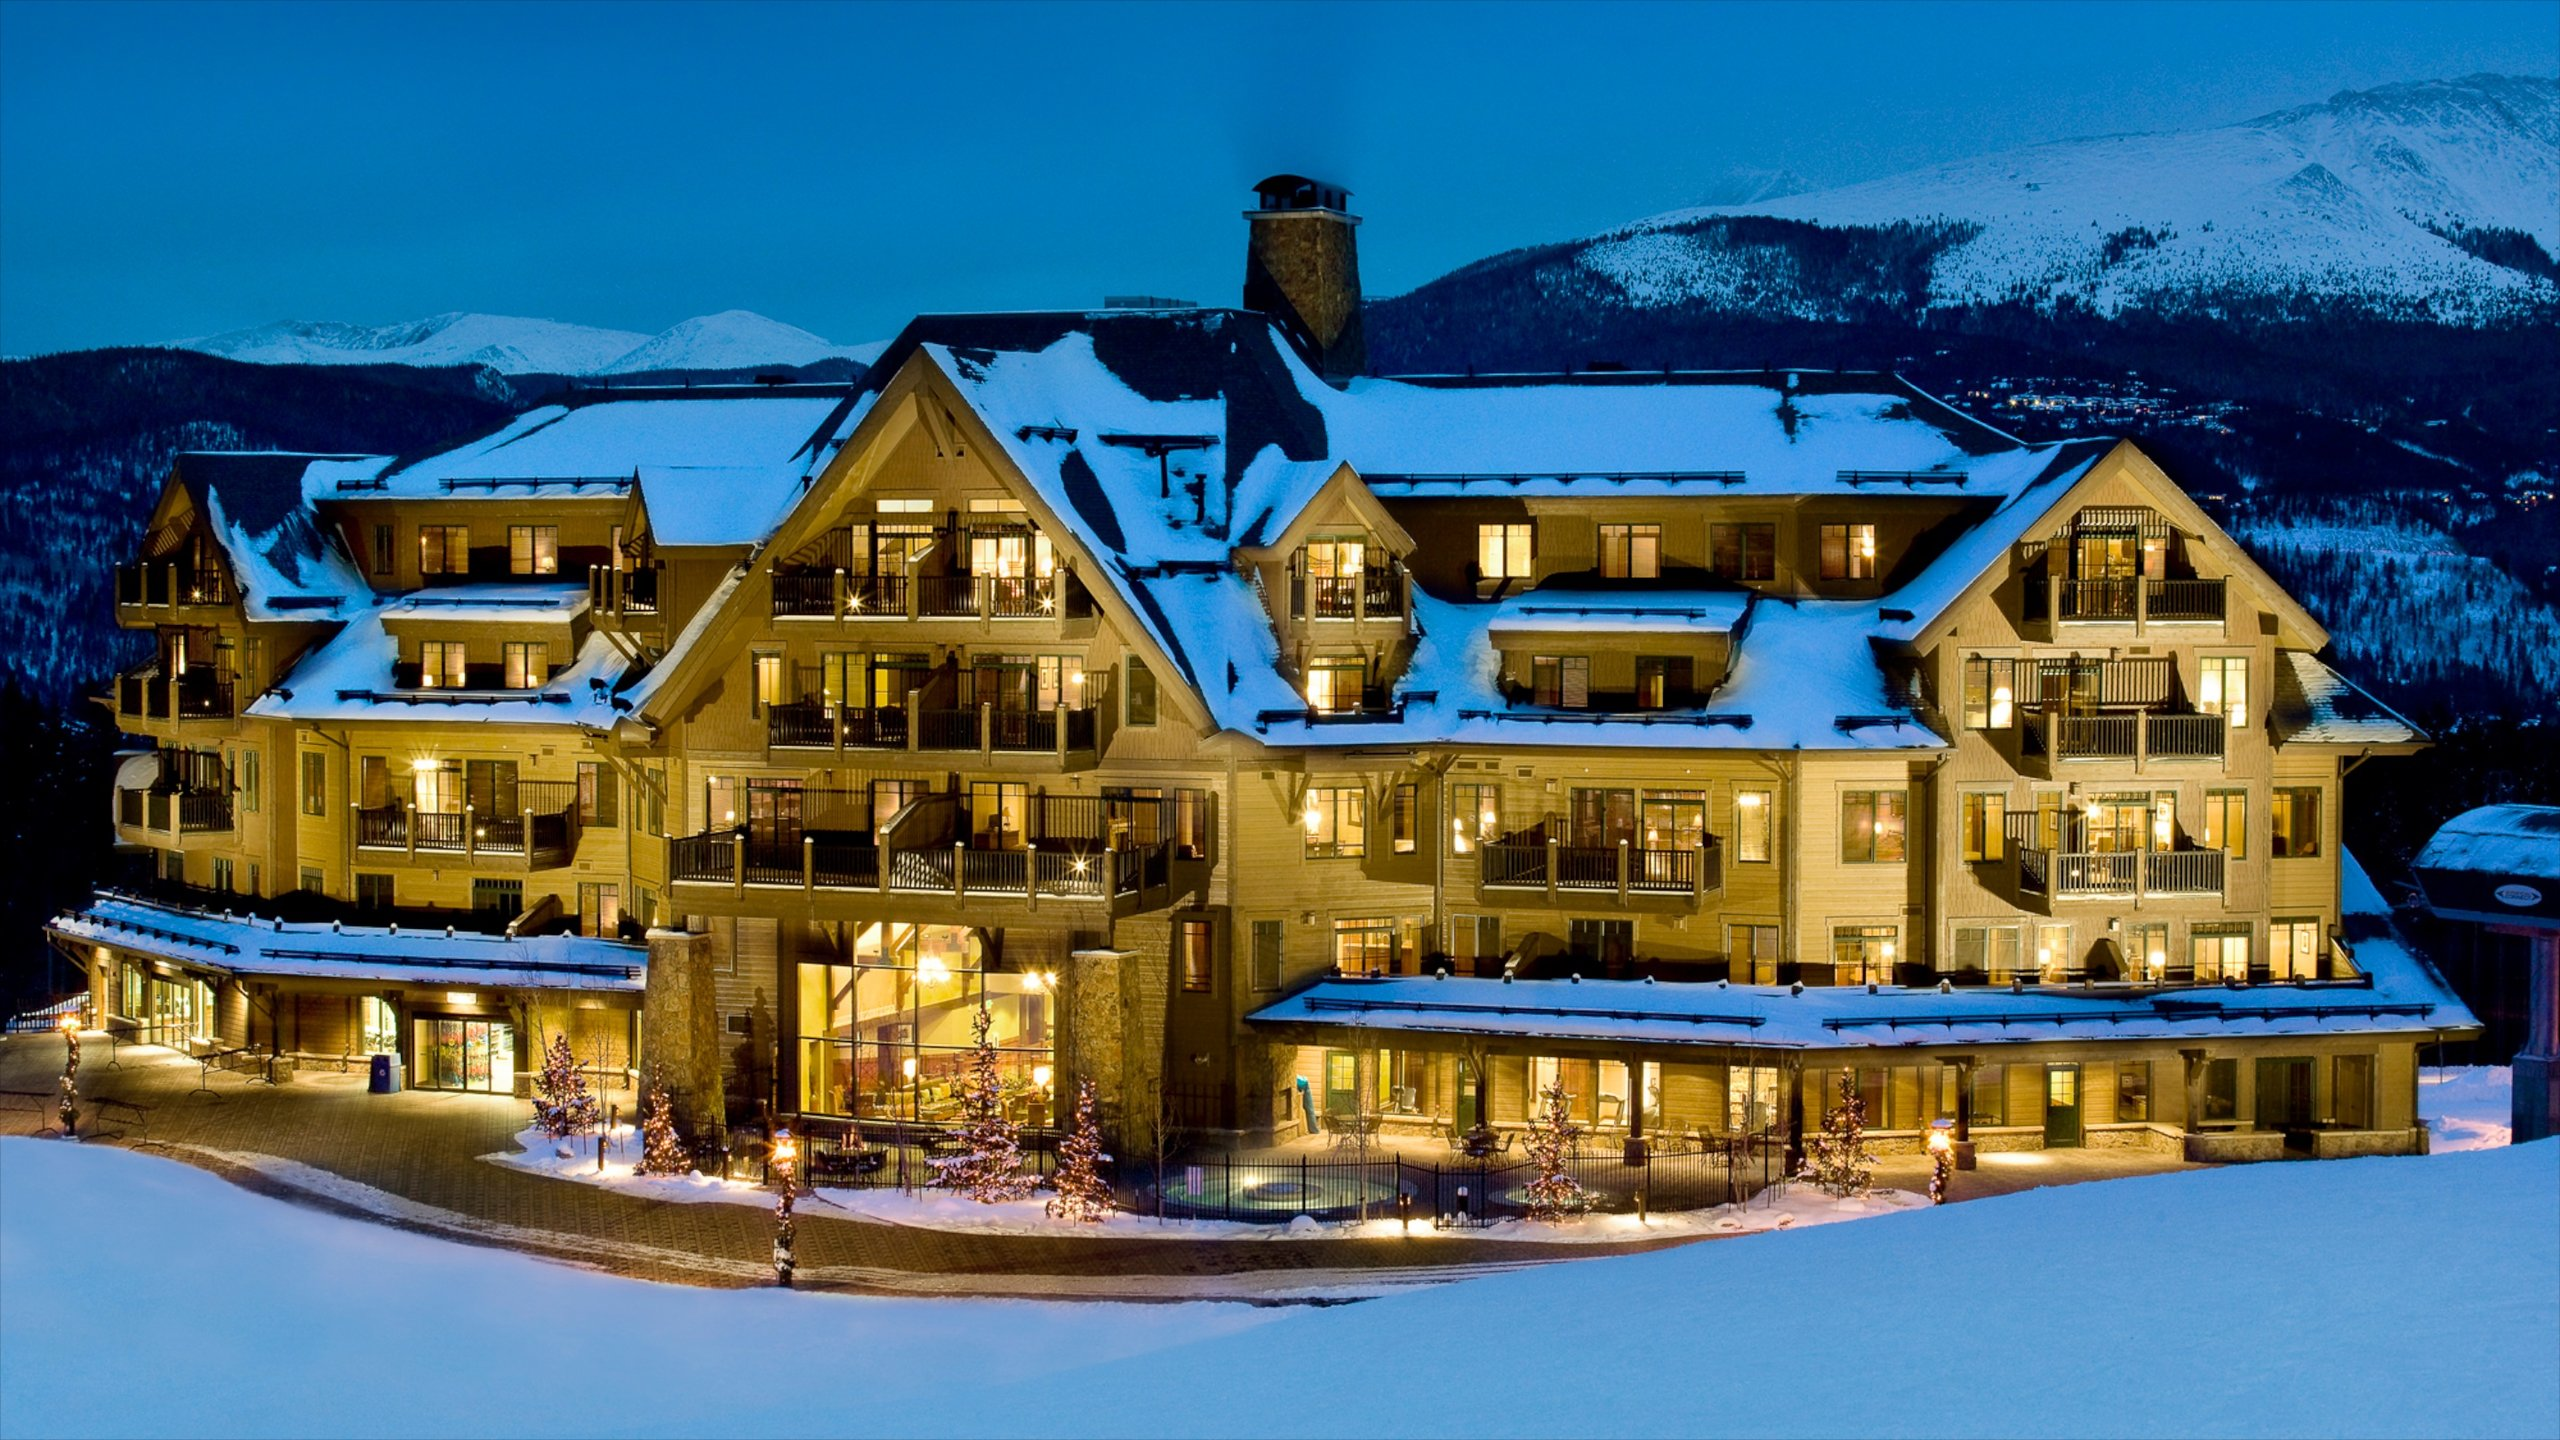 Silverthorne, Colorado, United States of America